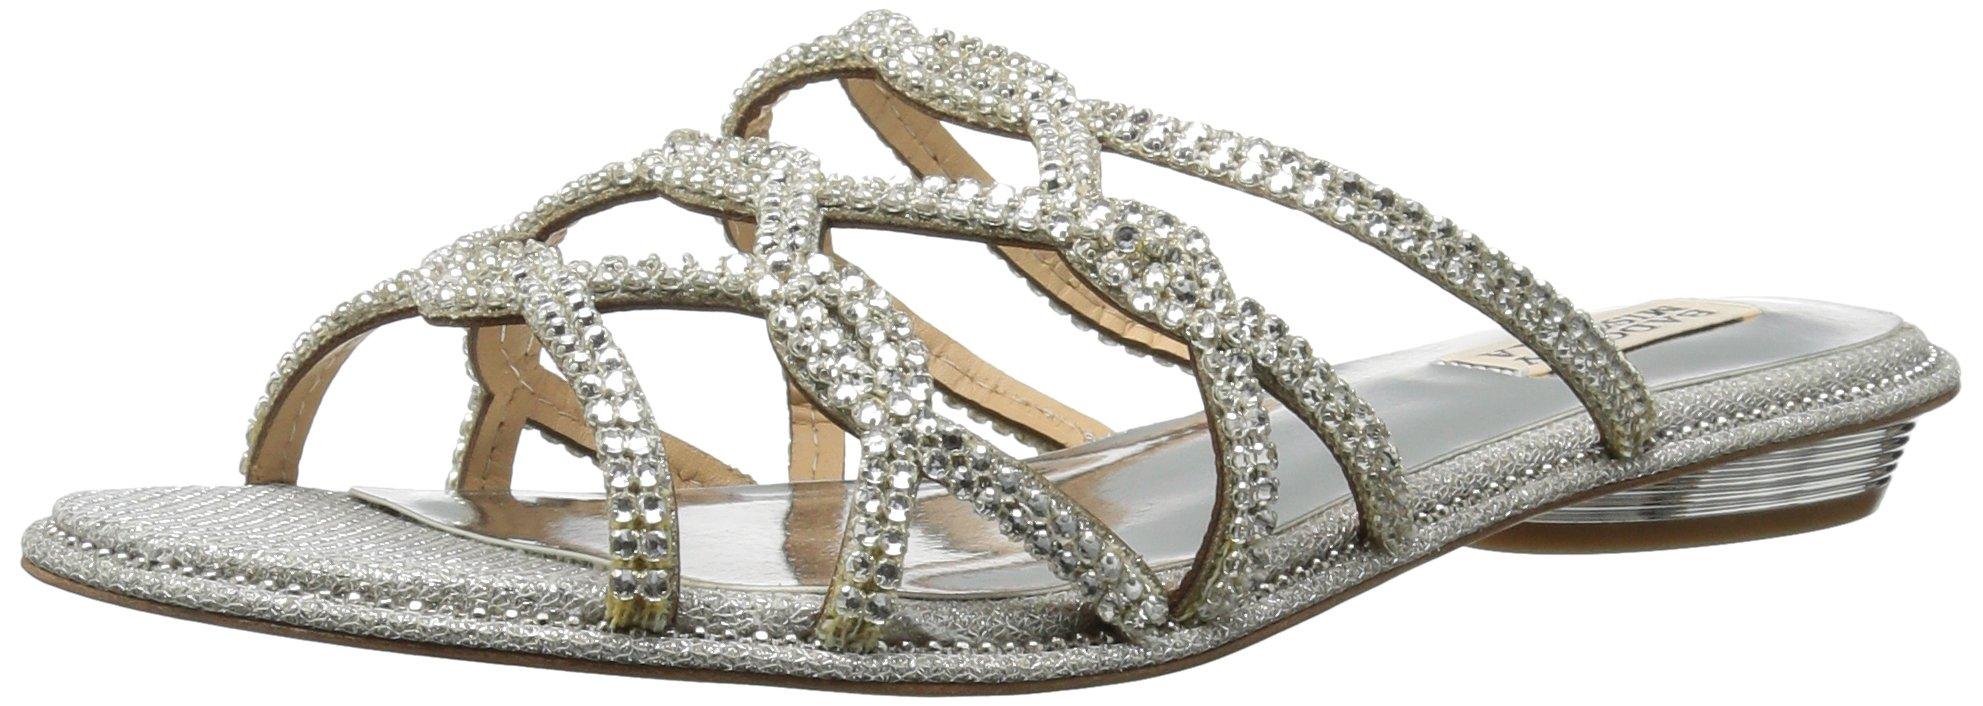 Badgley Mischka Women's Sofie Flat Sandal, Silver, 9 M US